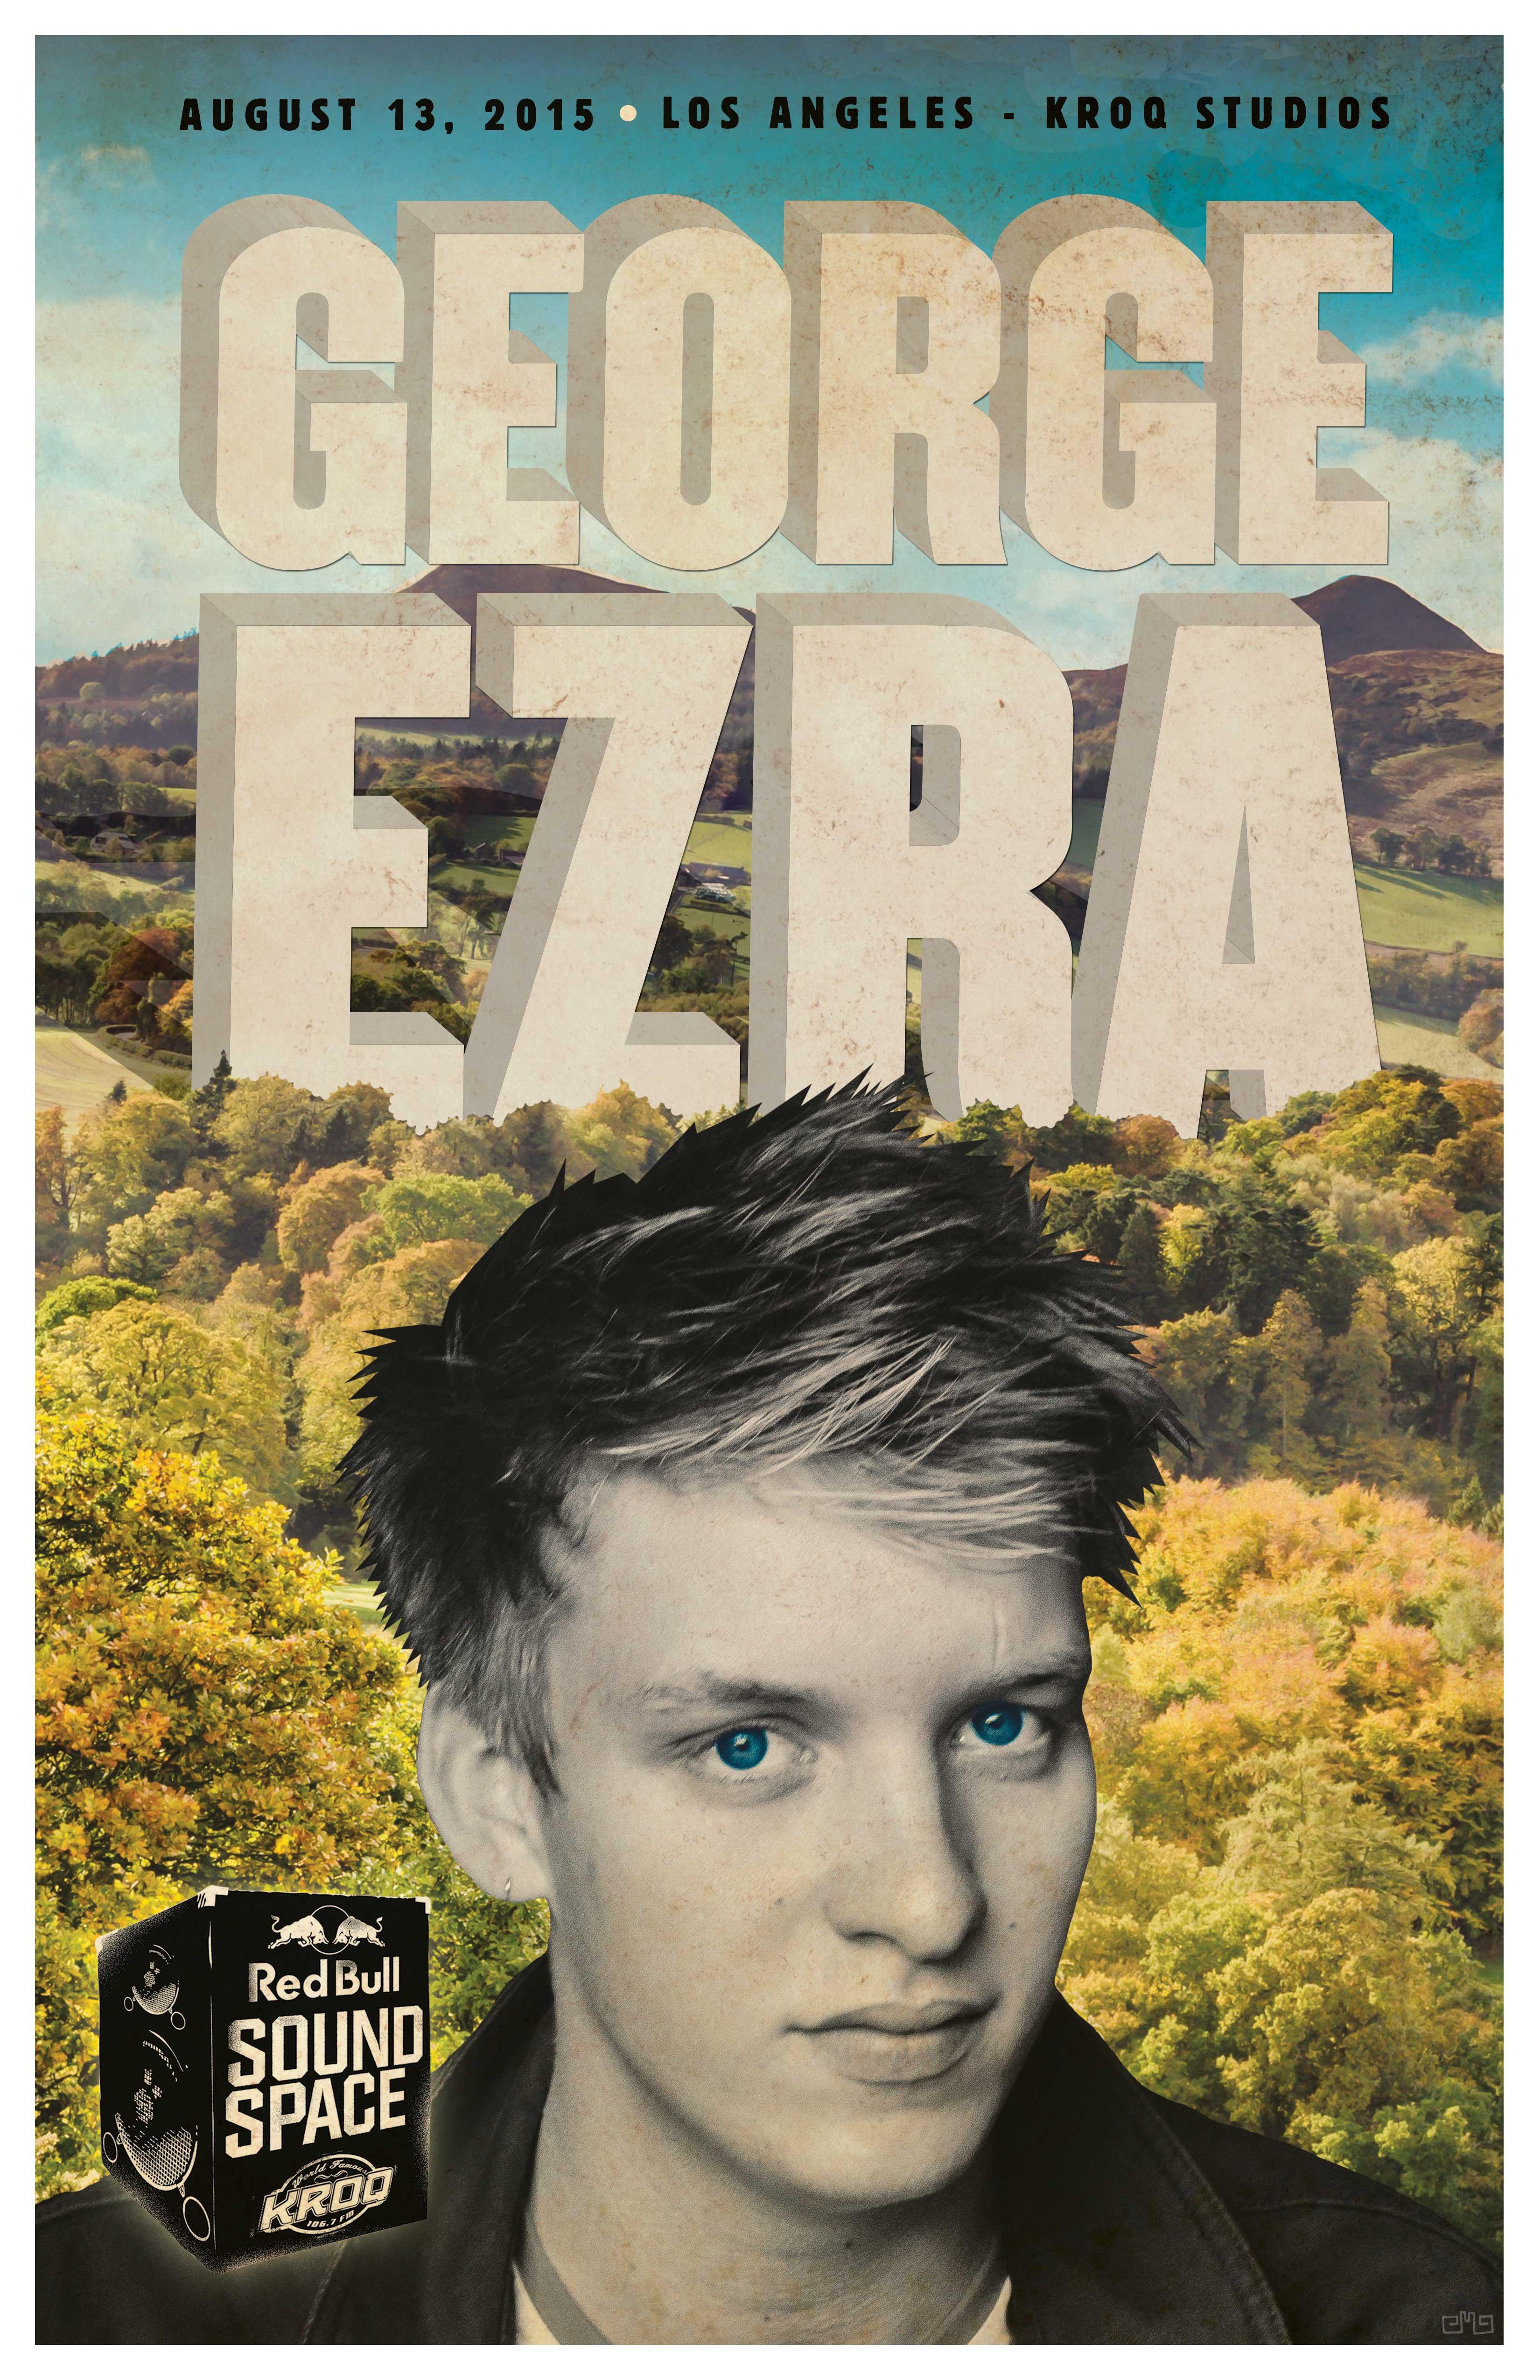 150729-George-Ezra-RBSS-poster-ff.jpg